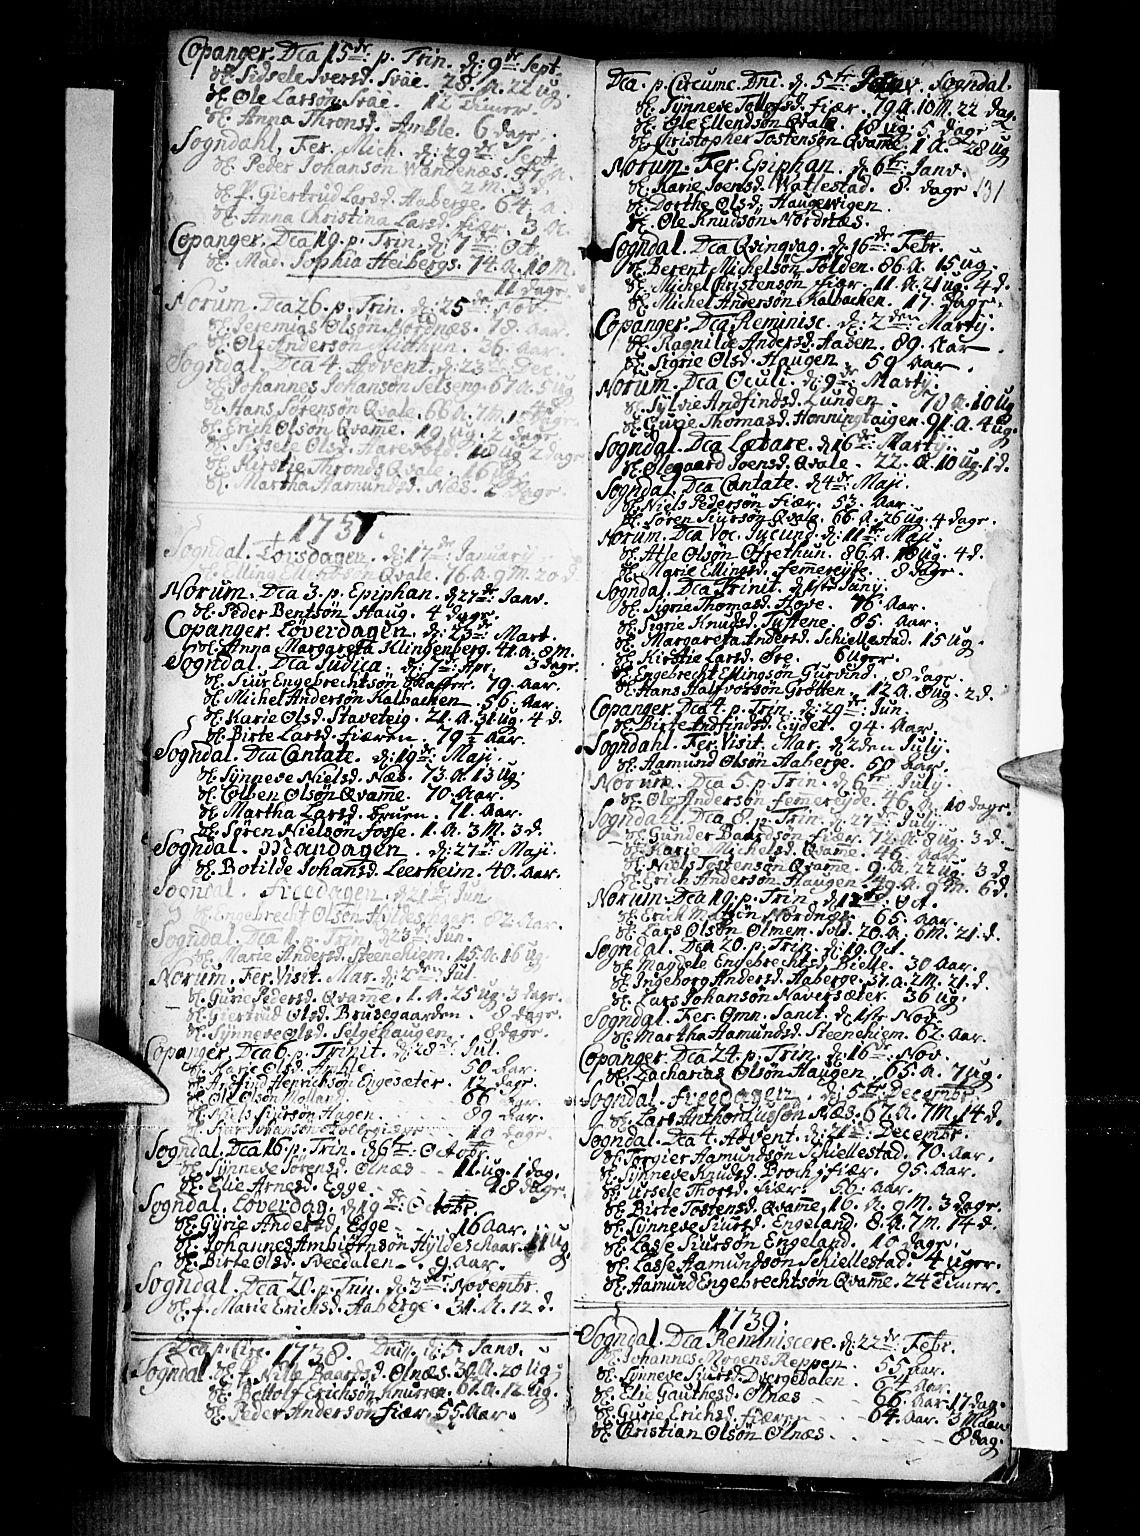 SAB, Sogndal sokneprestembete, H/Haa/Haaa/L0002: Ministerialbok nr. A 2, 1725-1741, s. 131